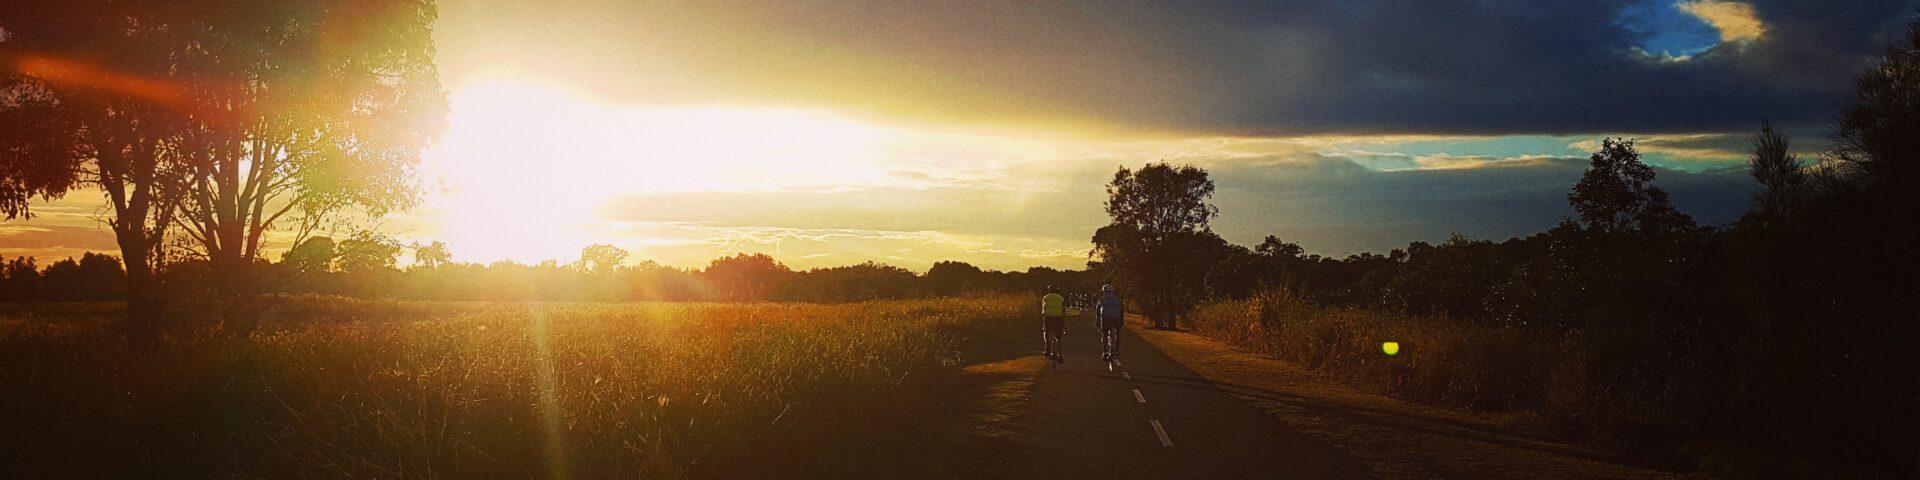 Nundah Cycleway Sunrise